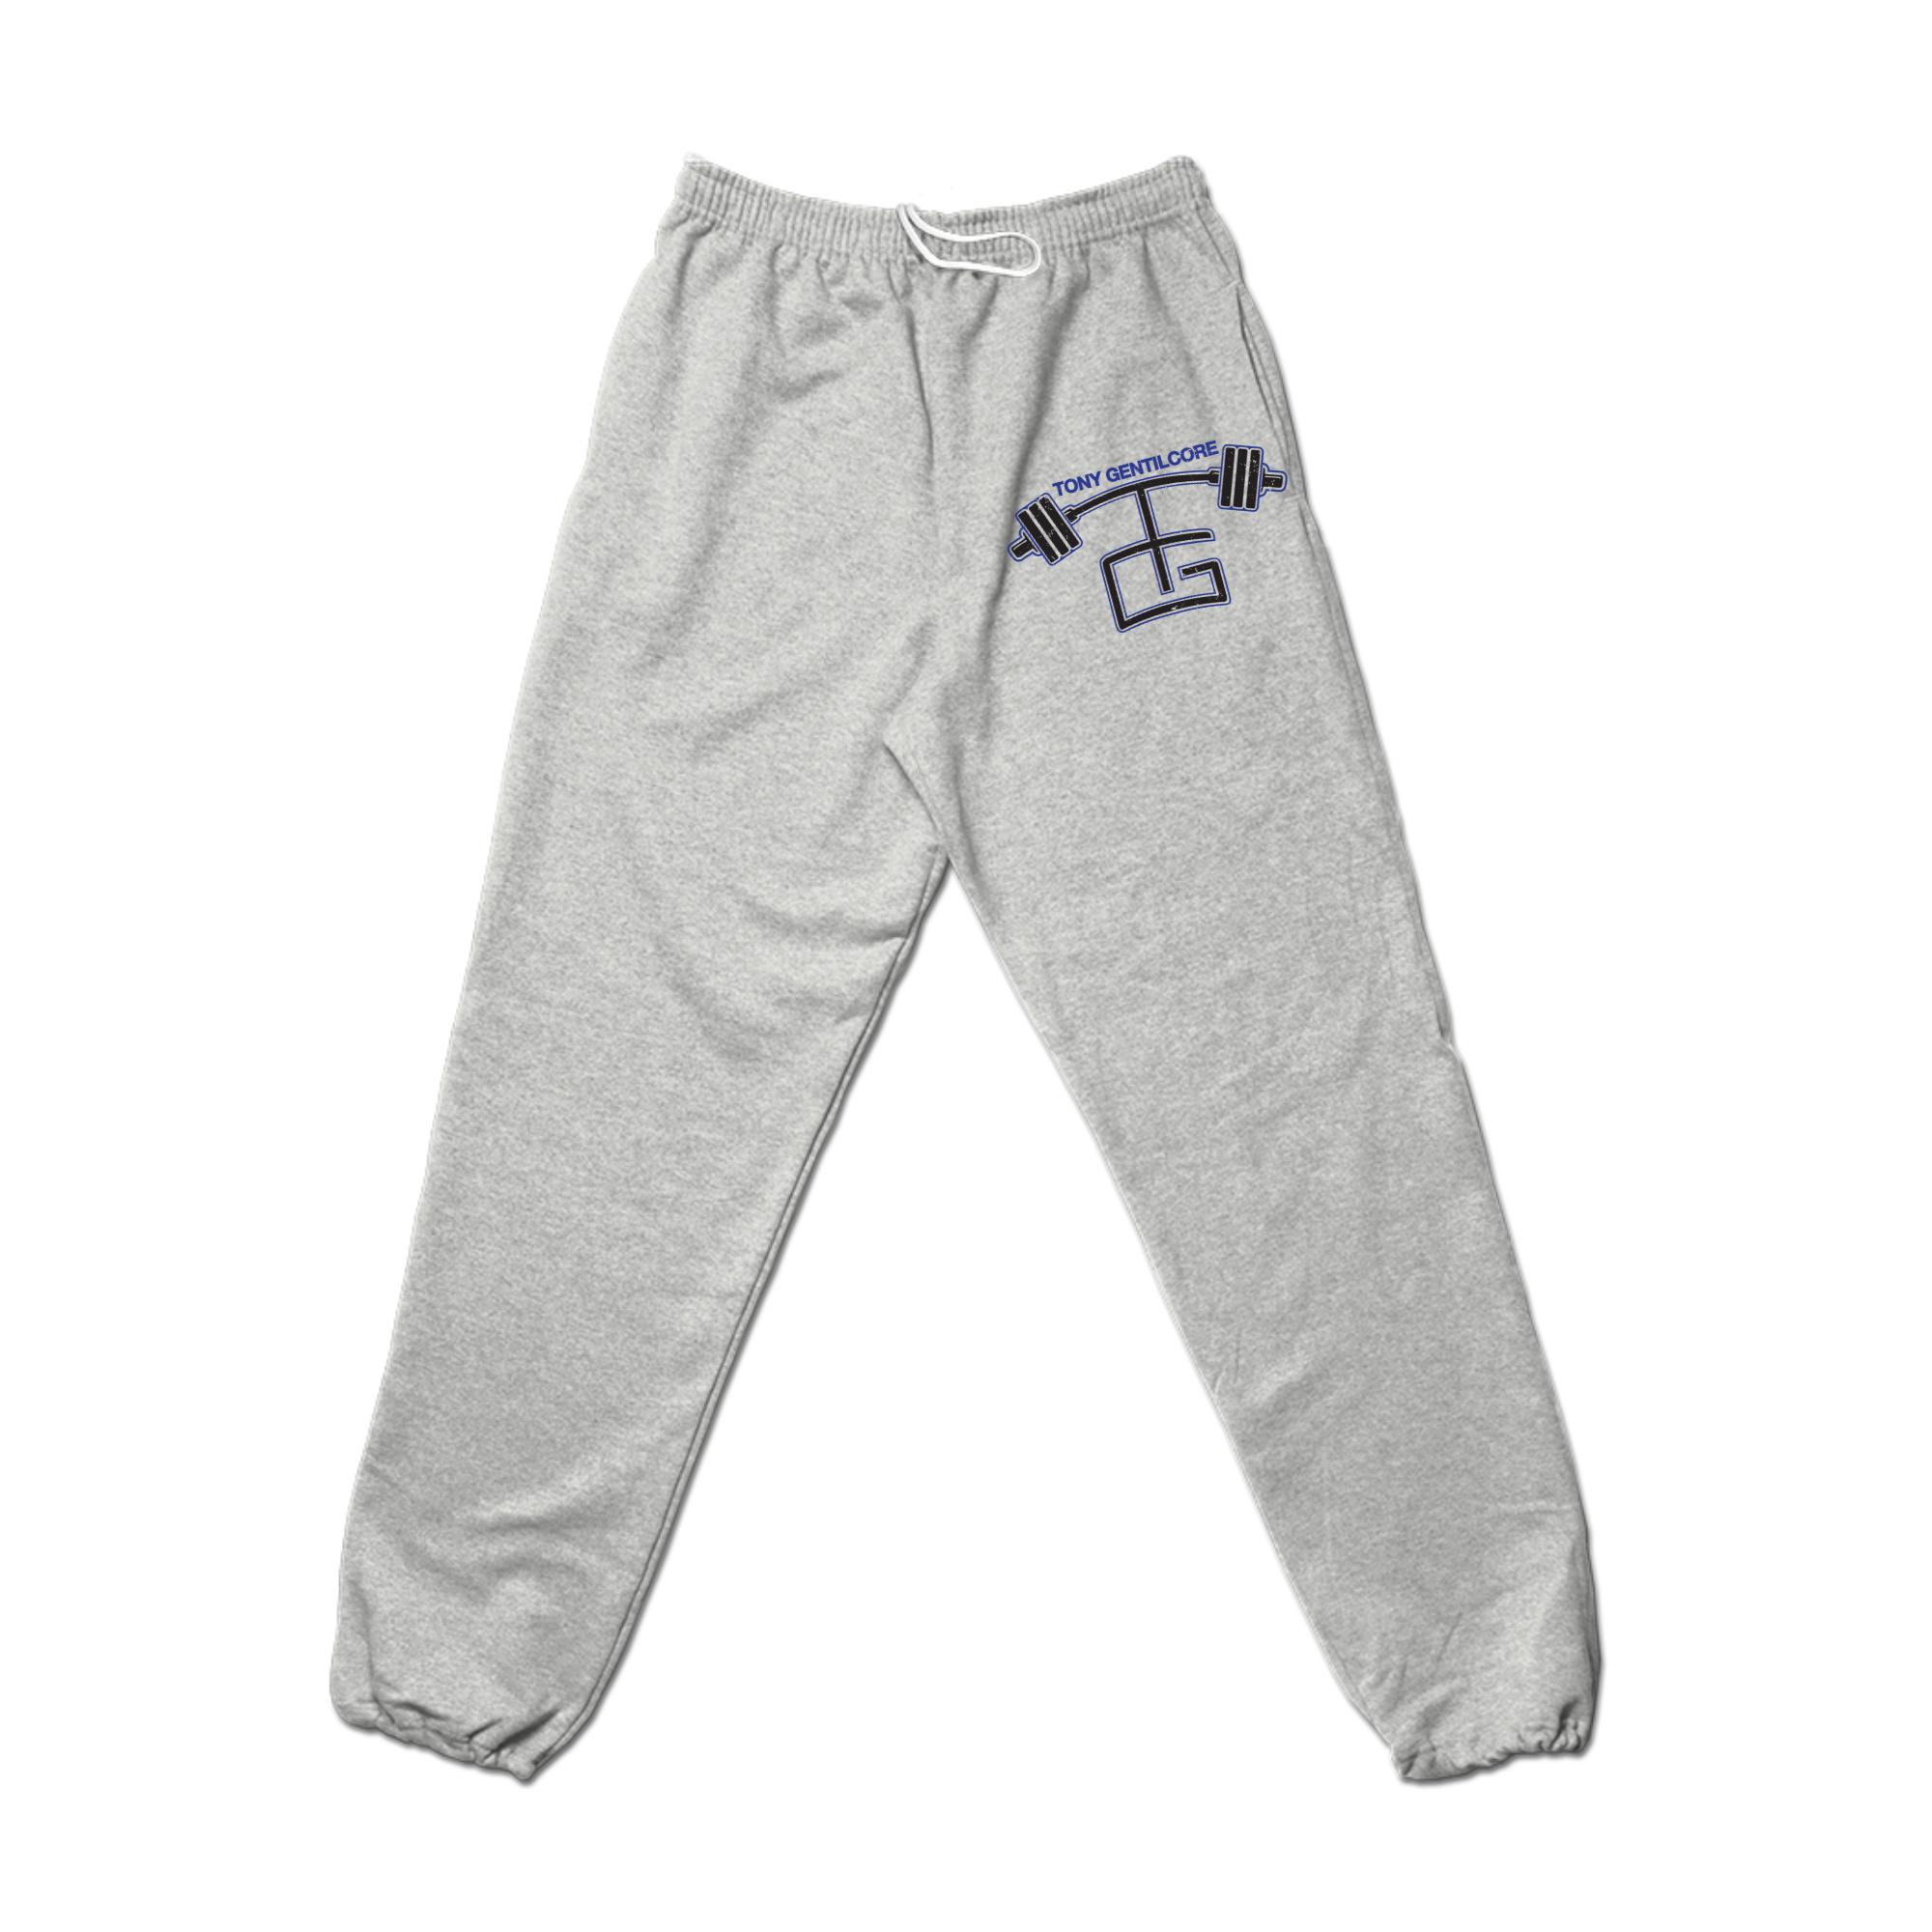 Tony Gentilcore Classic Sweatpants